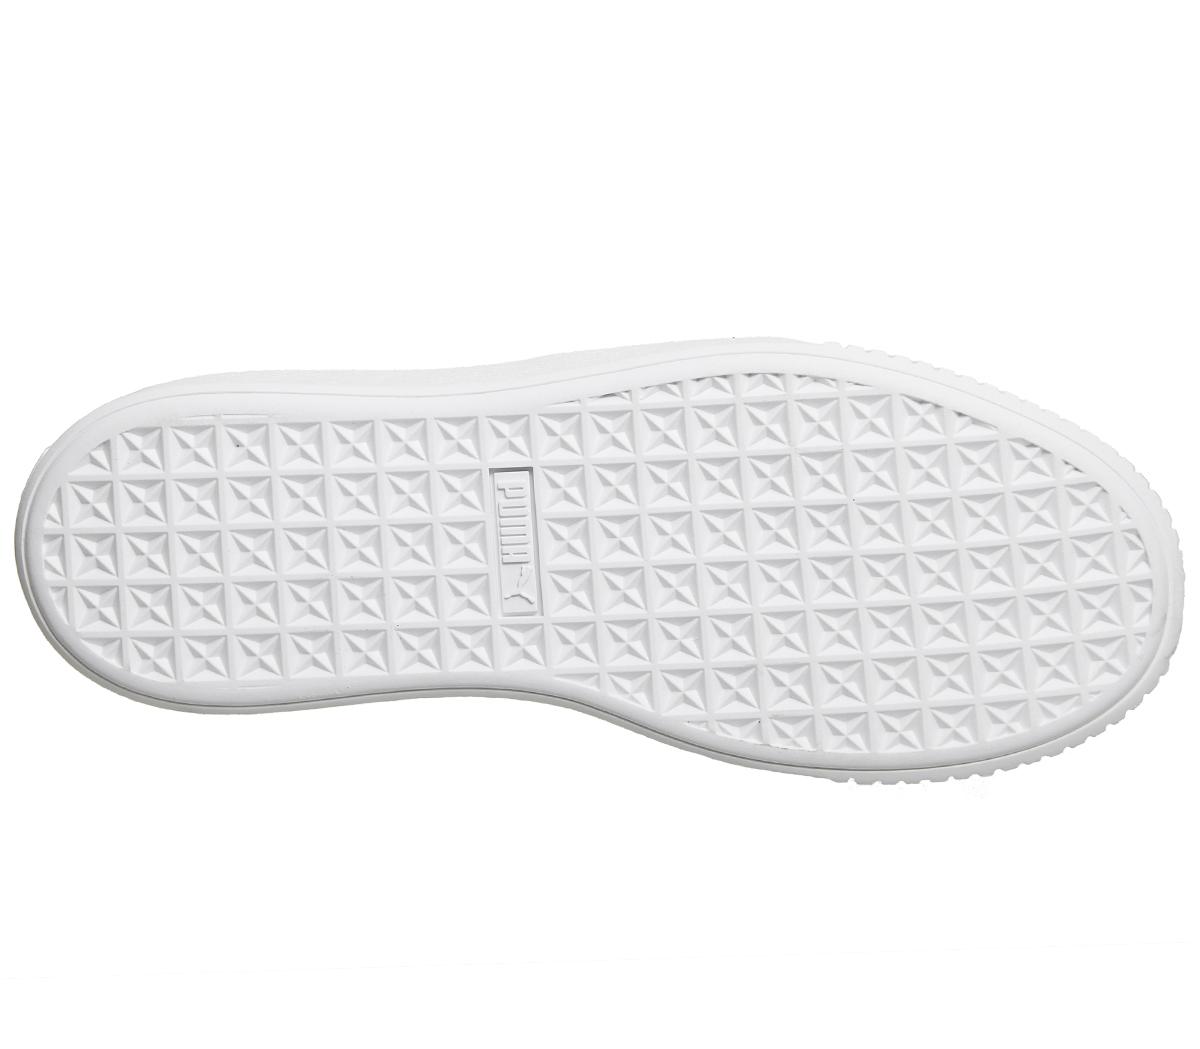 Femme Puma Basket Platform Trainers chaussures GOLD GLITTER blanc Trainers chaussures Trainers 5e004c